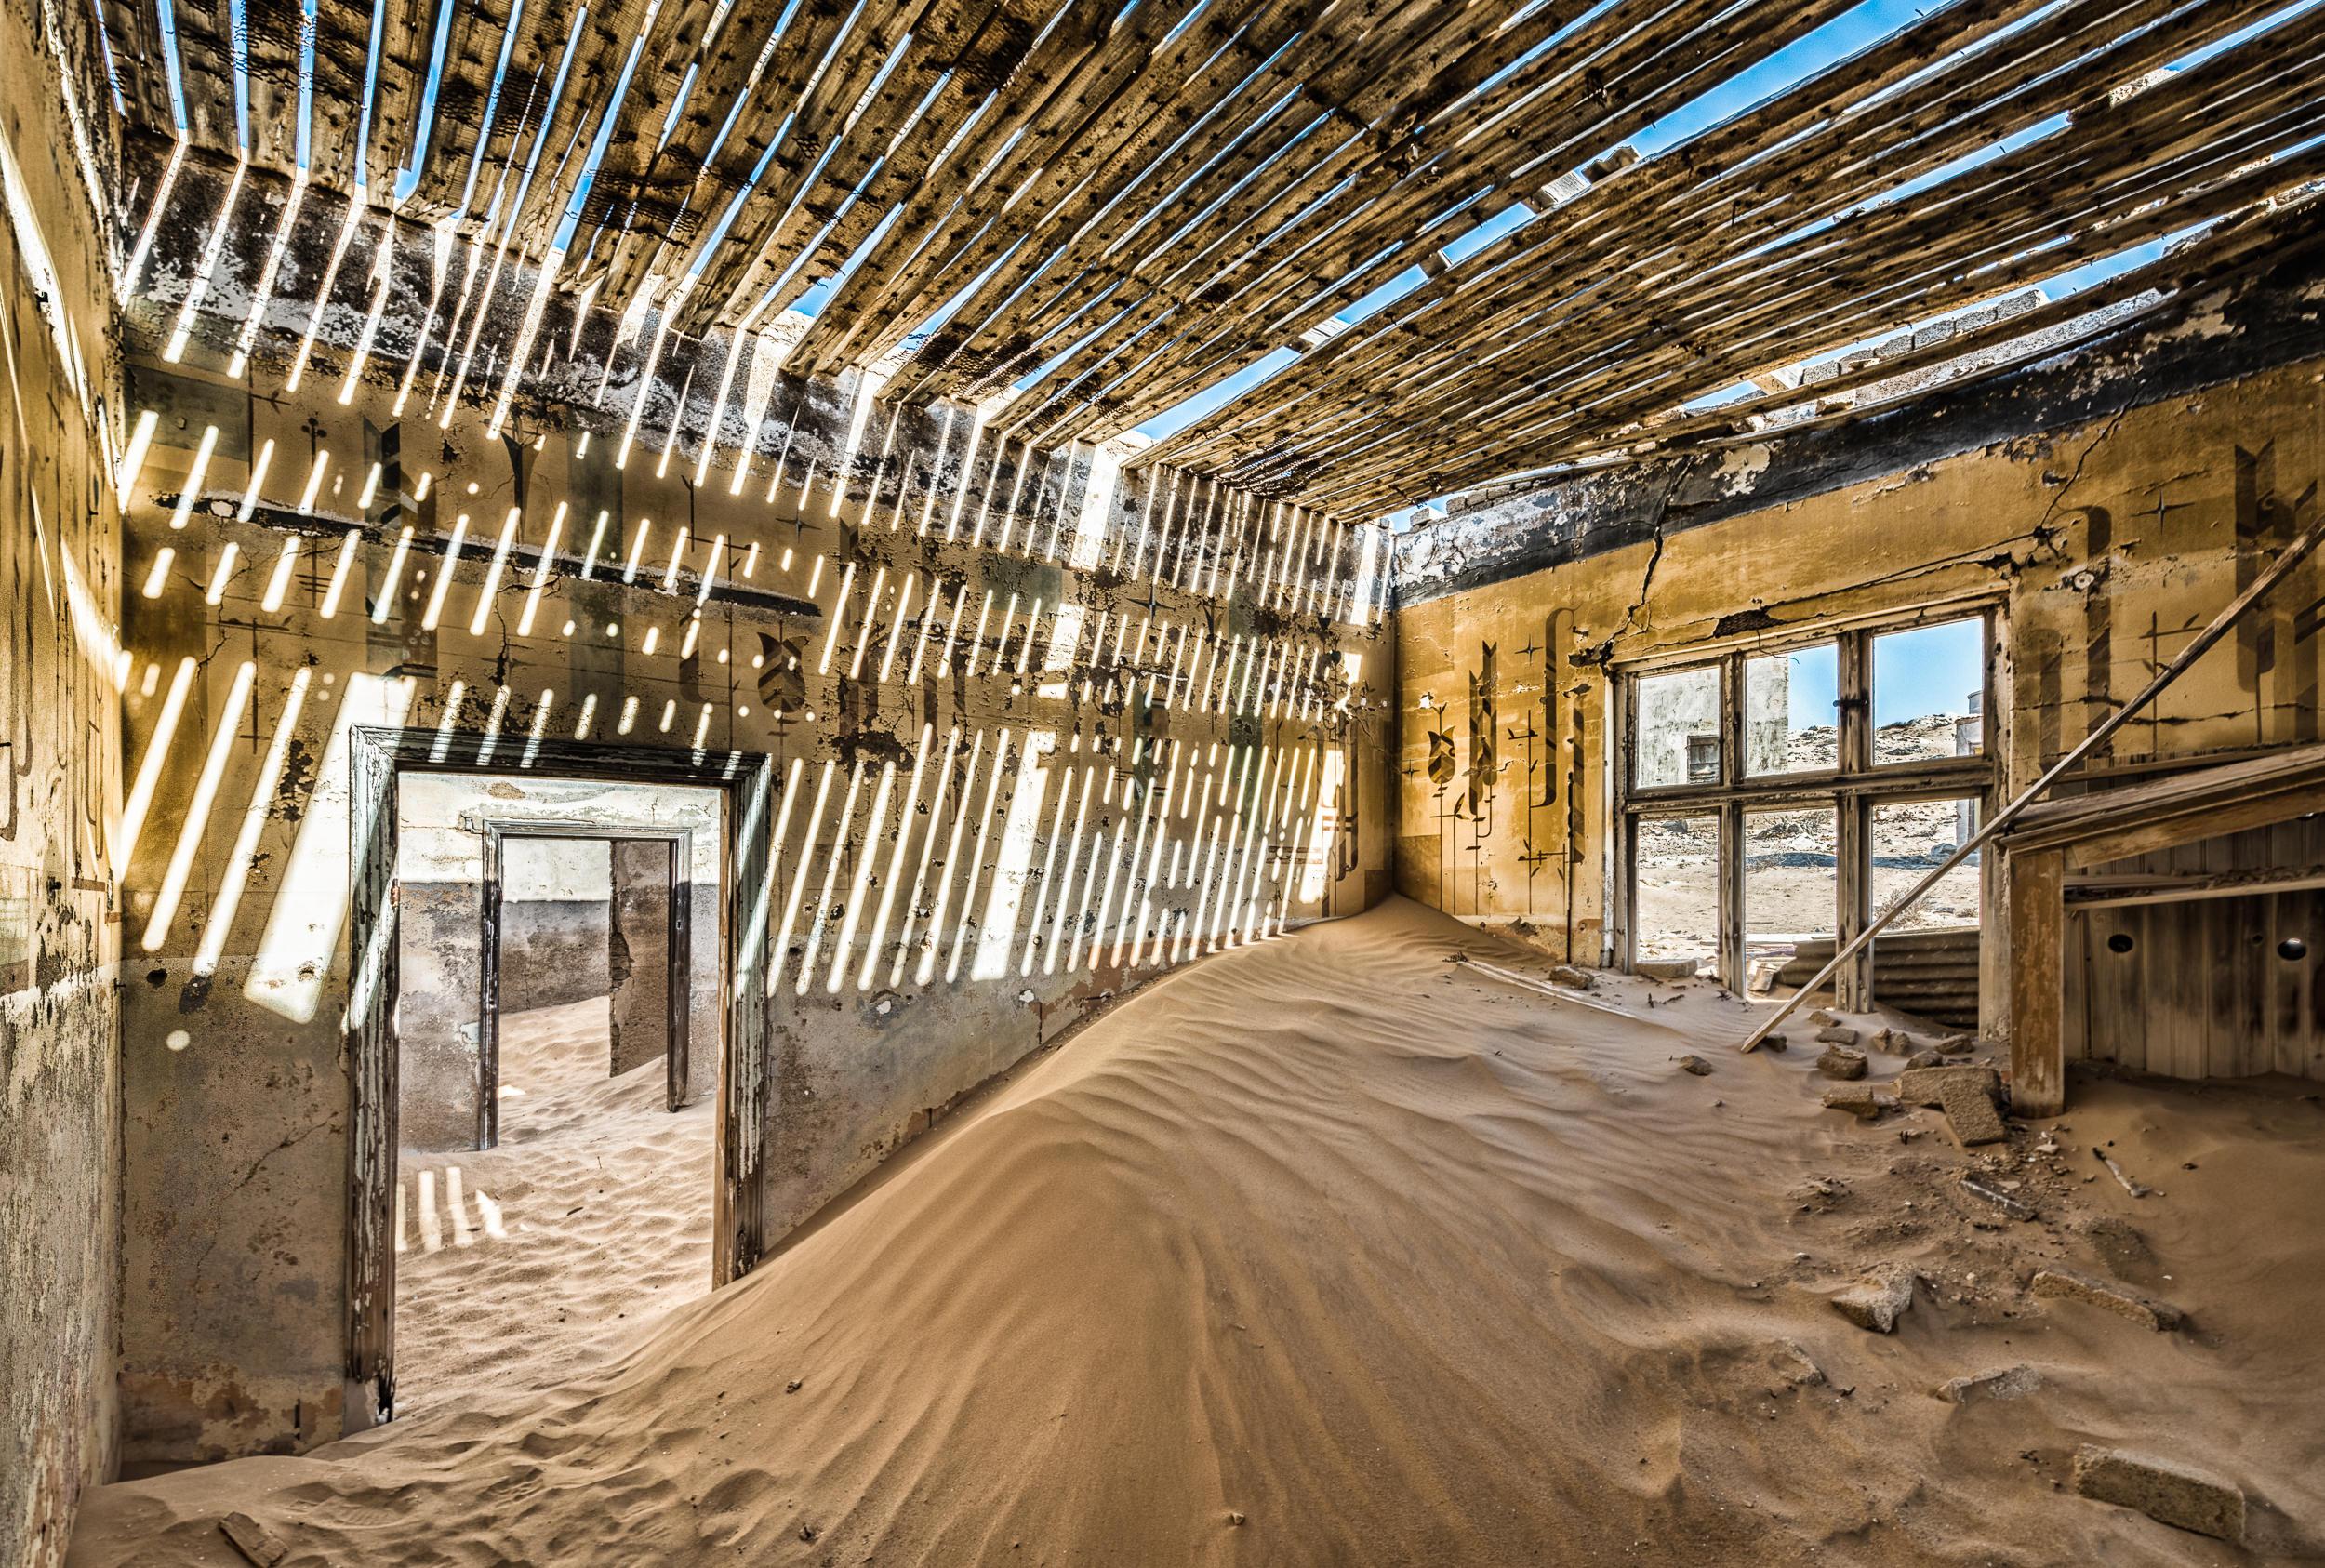 [2016 06 10] Namibia Kolmanskop (NIKON D800) 7183-HDR-Edit.jpg